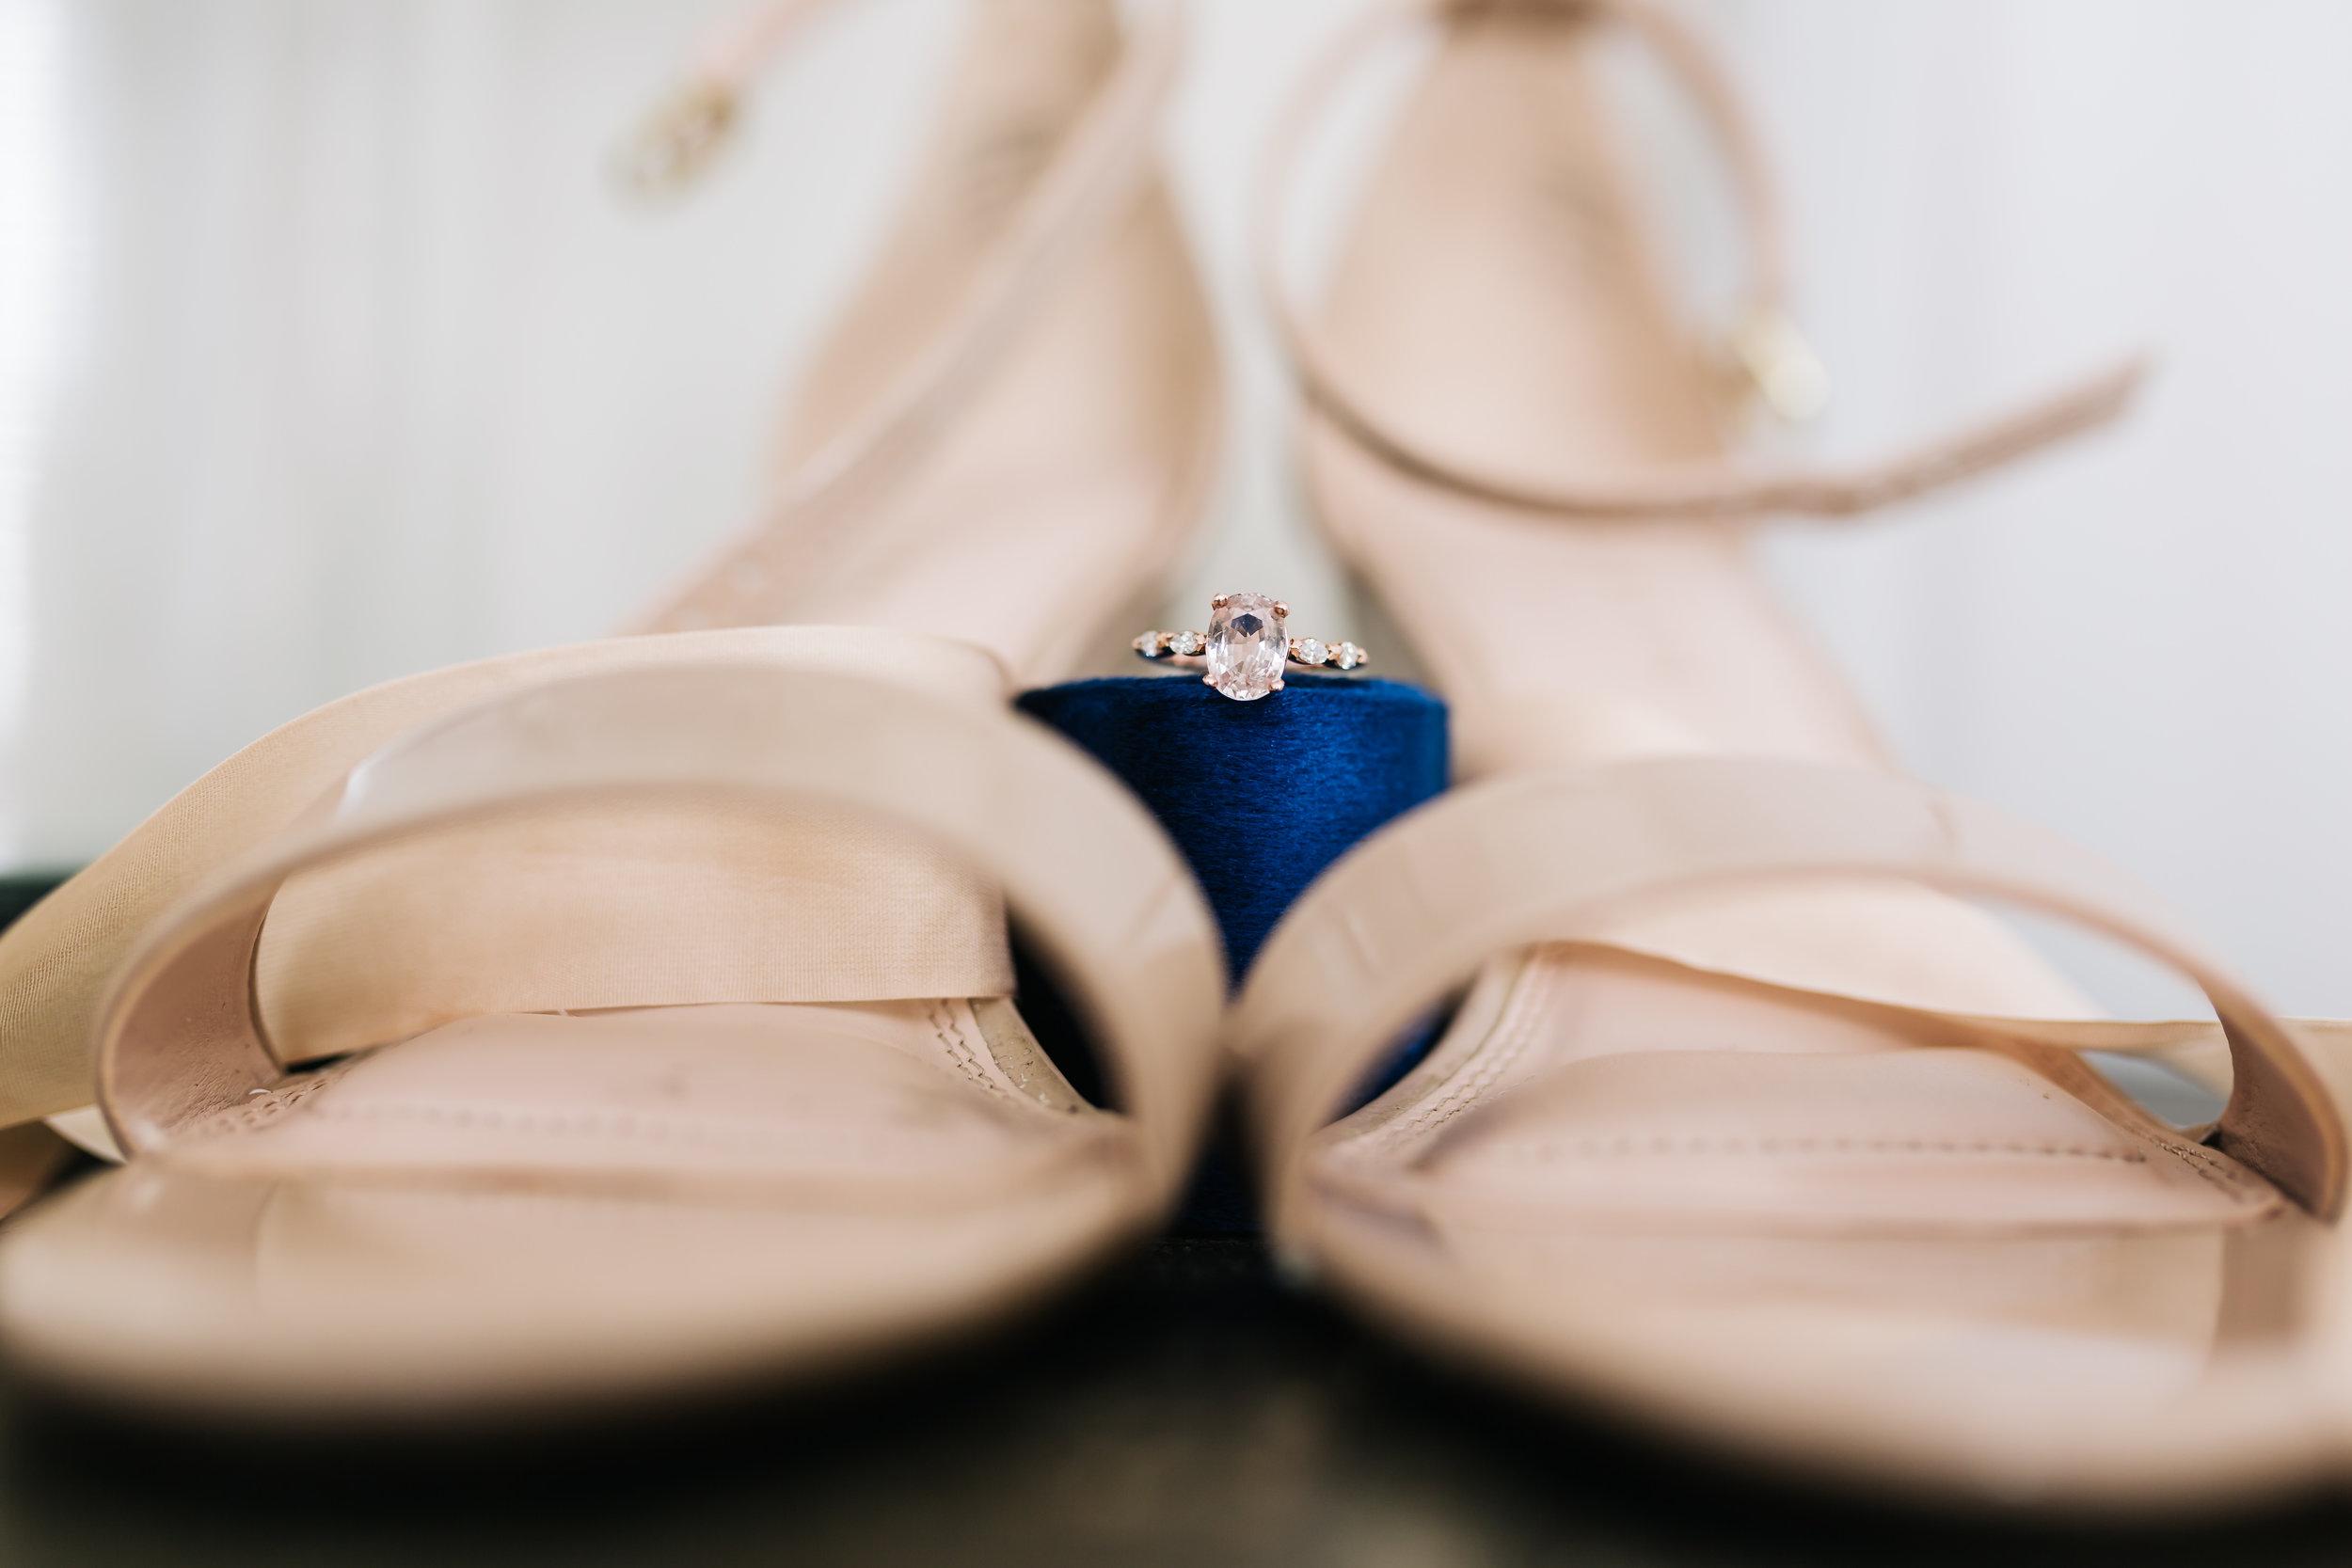 2018.09.02 Ray and Sarah Prizner Nashville TN Wedding FINALS-17.jpg